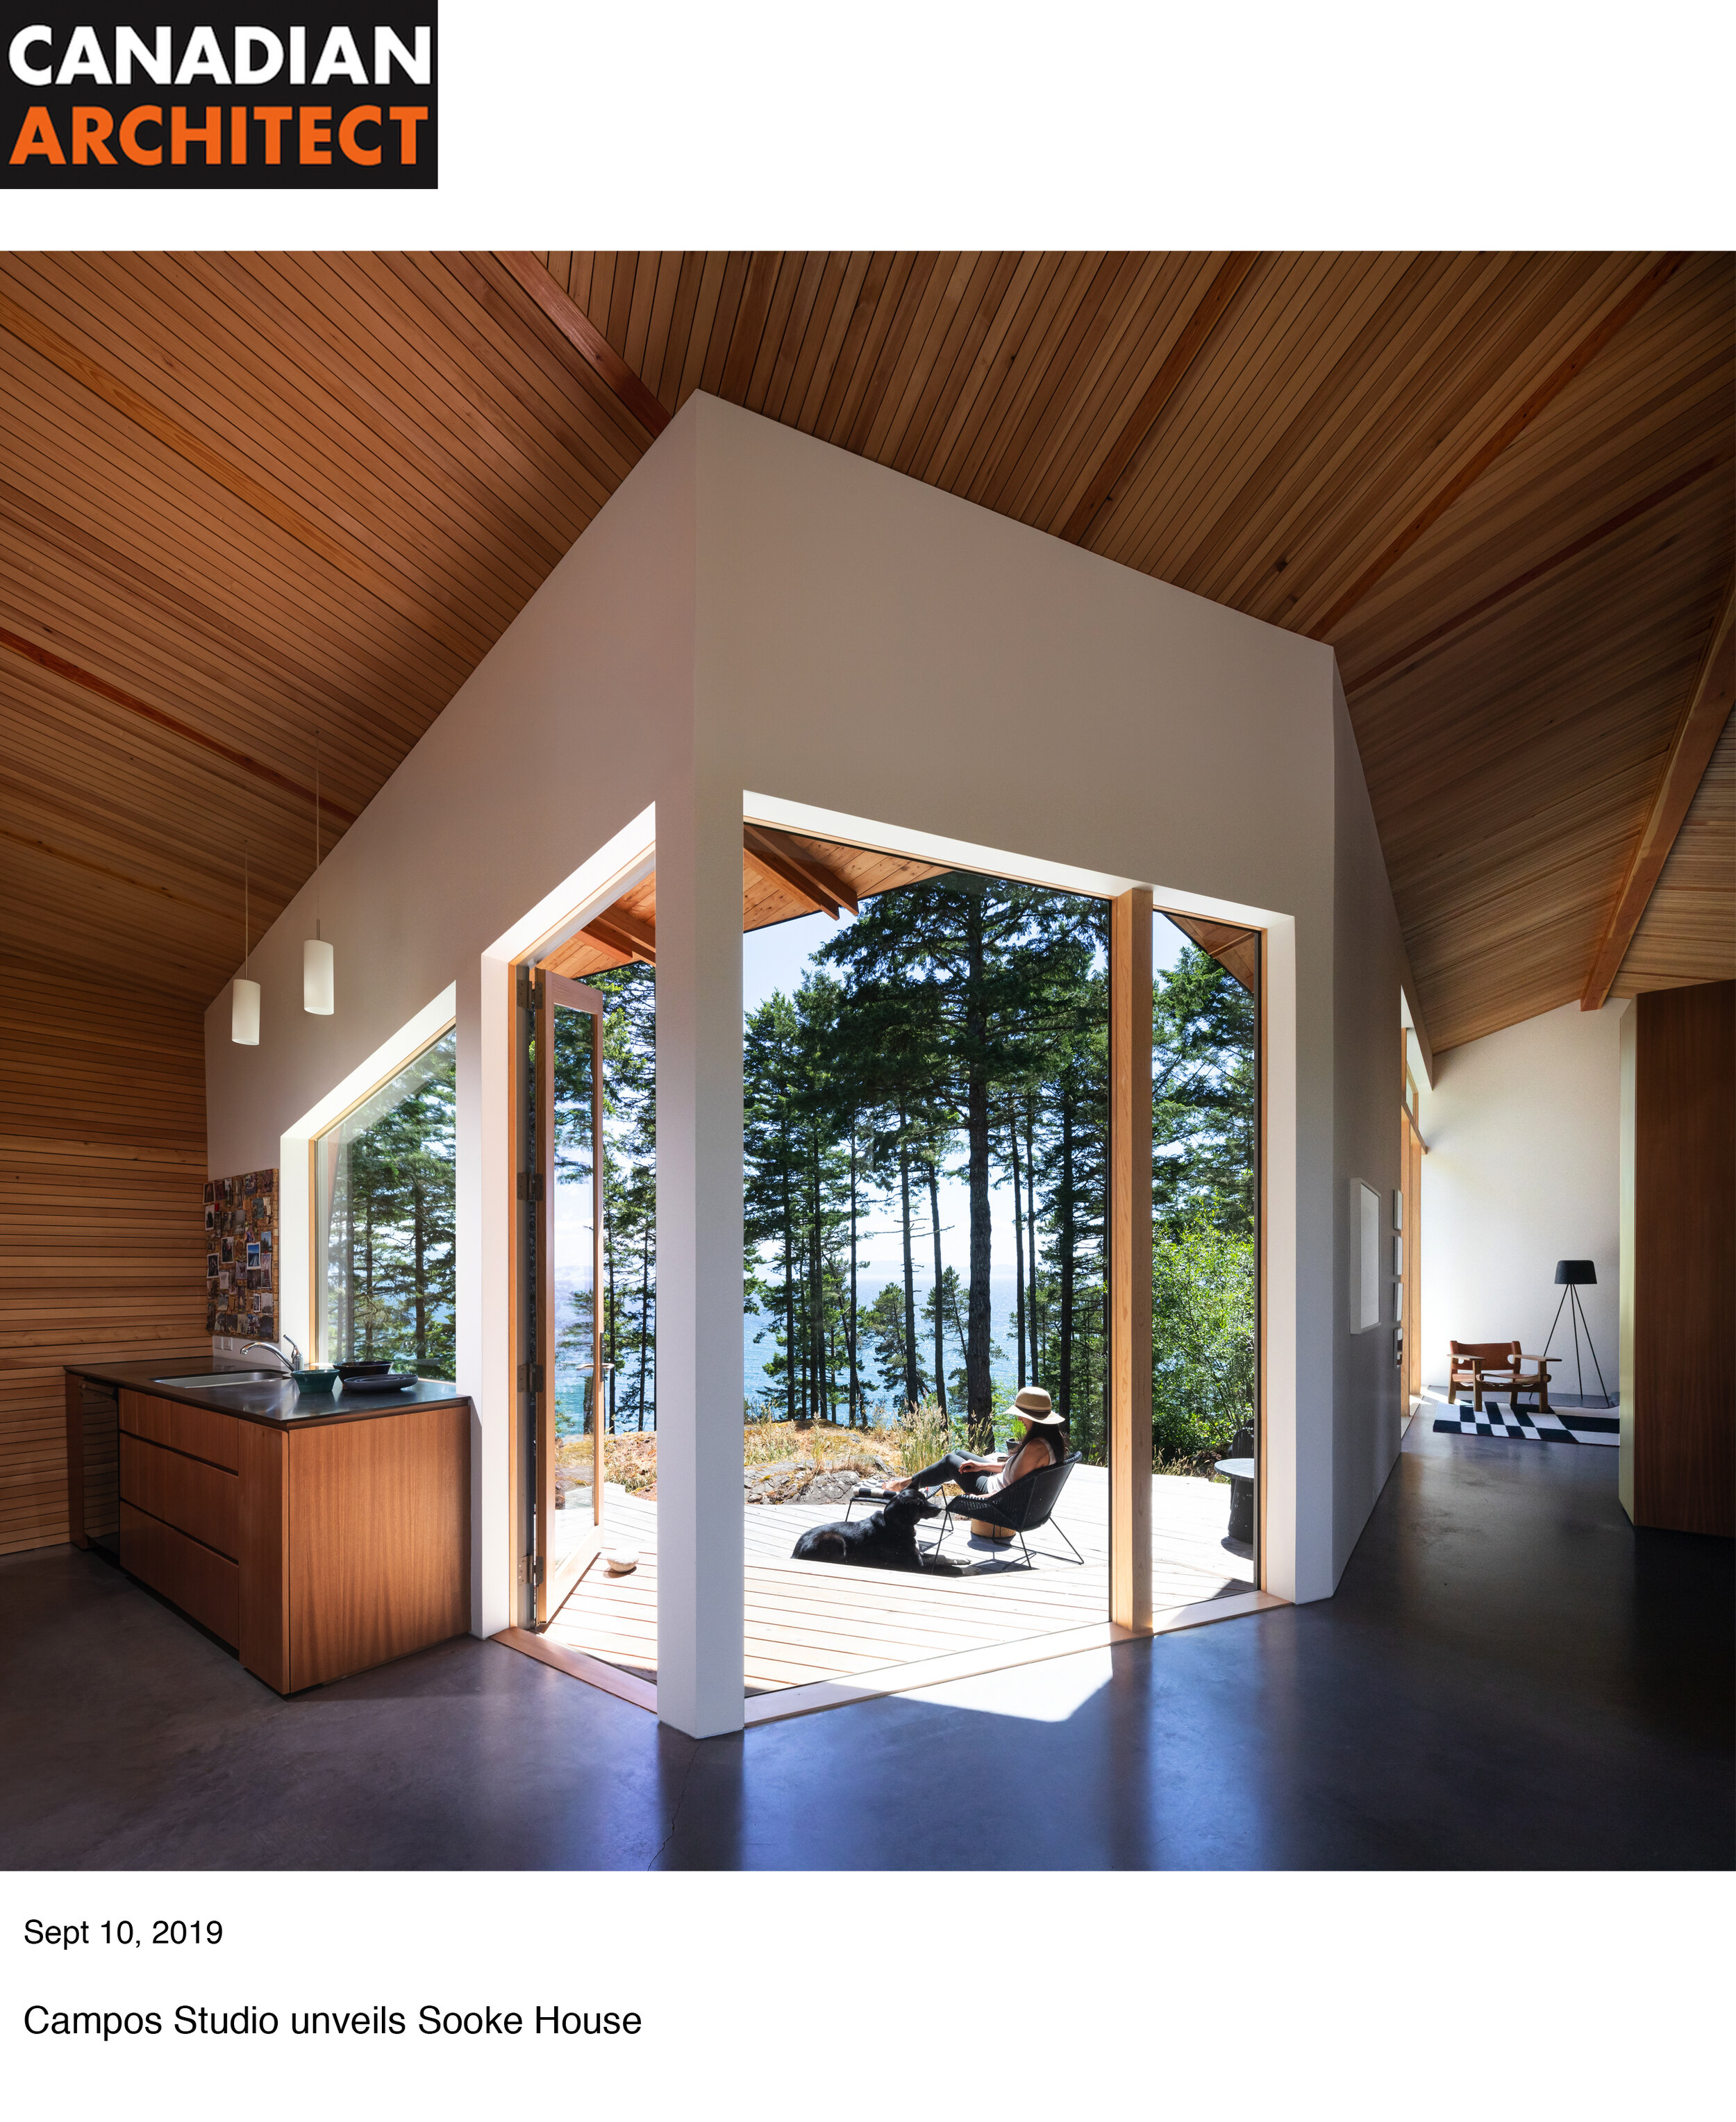 Canadian Architect Press.jpg